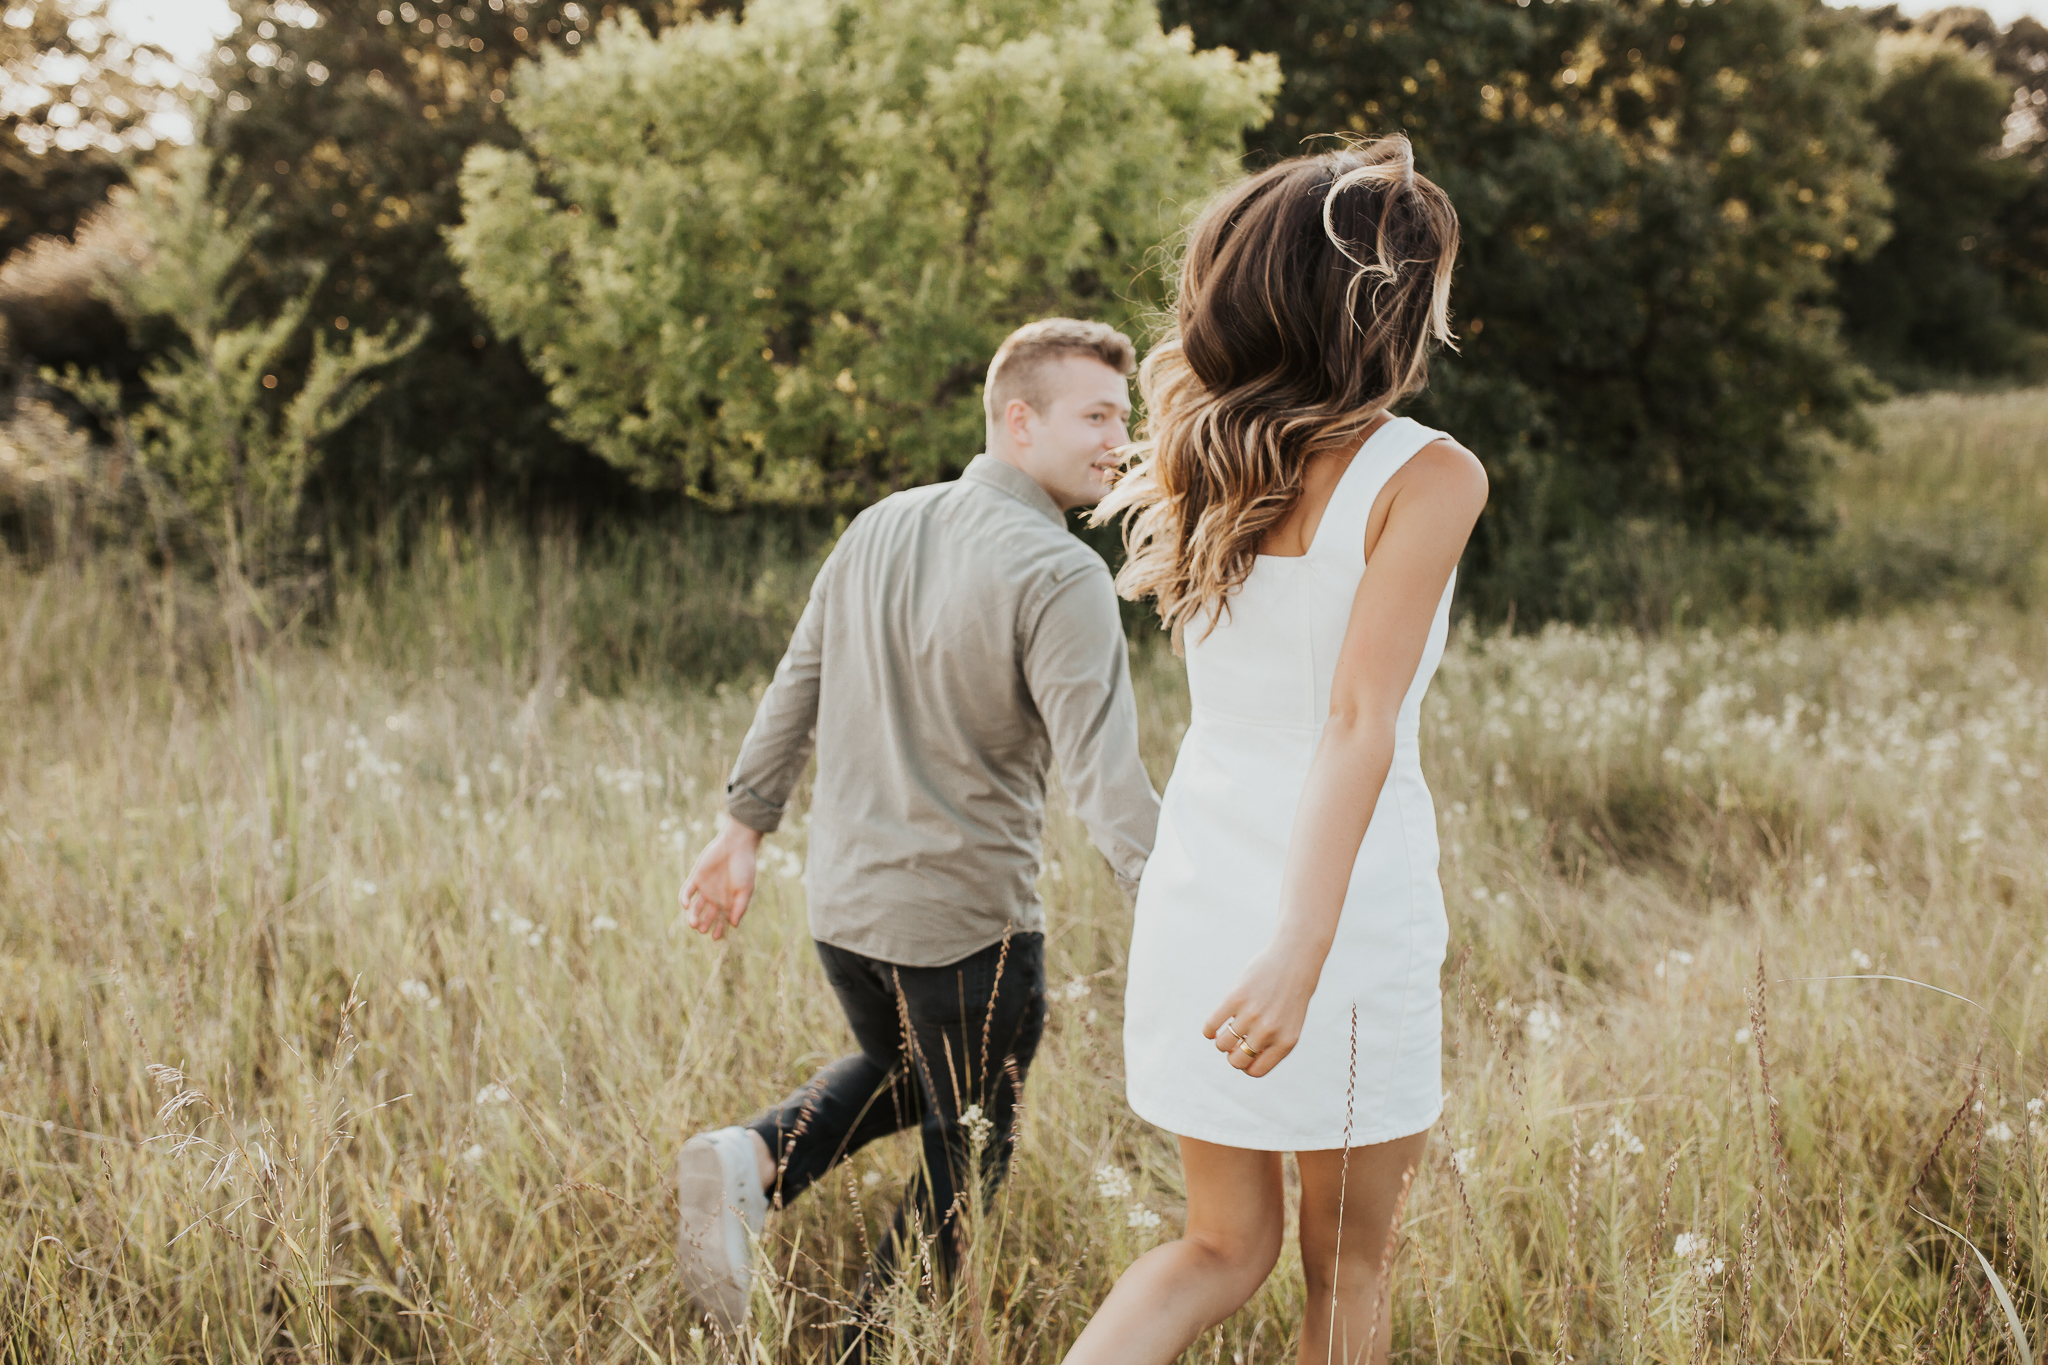 JakeRachel-Engagement-27.jpg